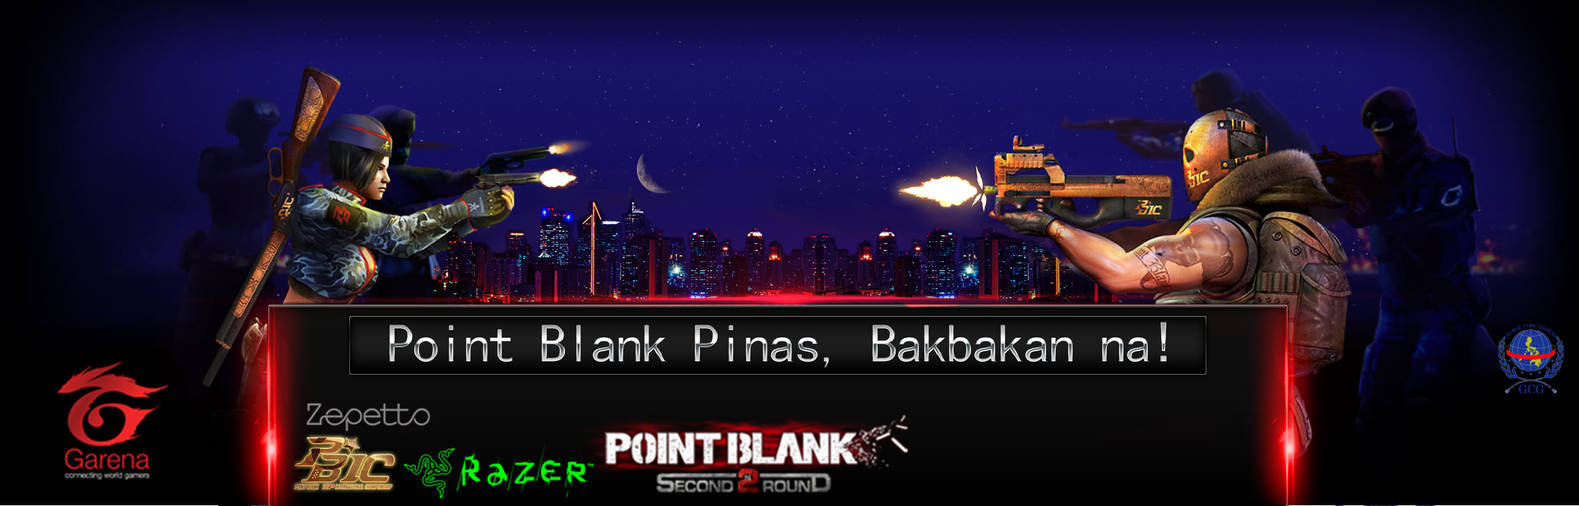 Point Blank Pinas, Bakbakan na! GCG #Crow by innogerard123